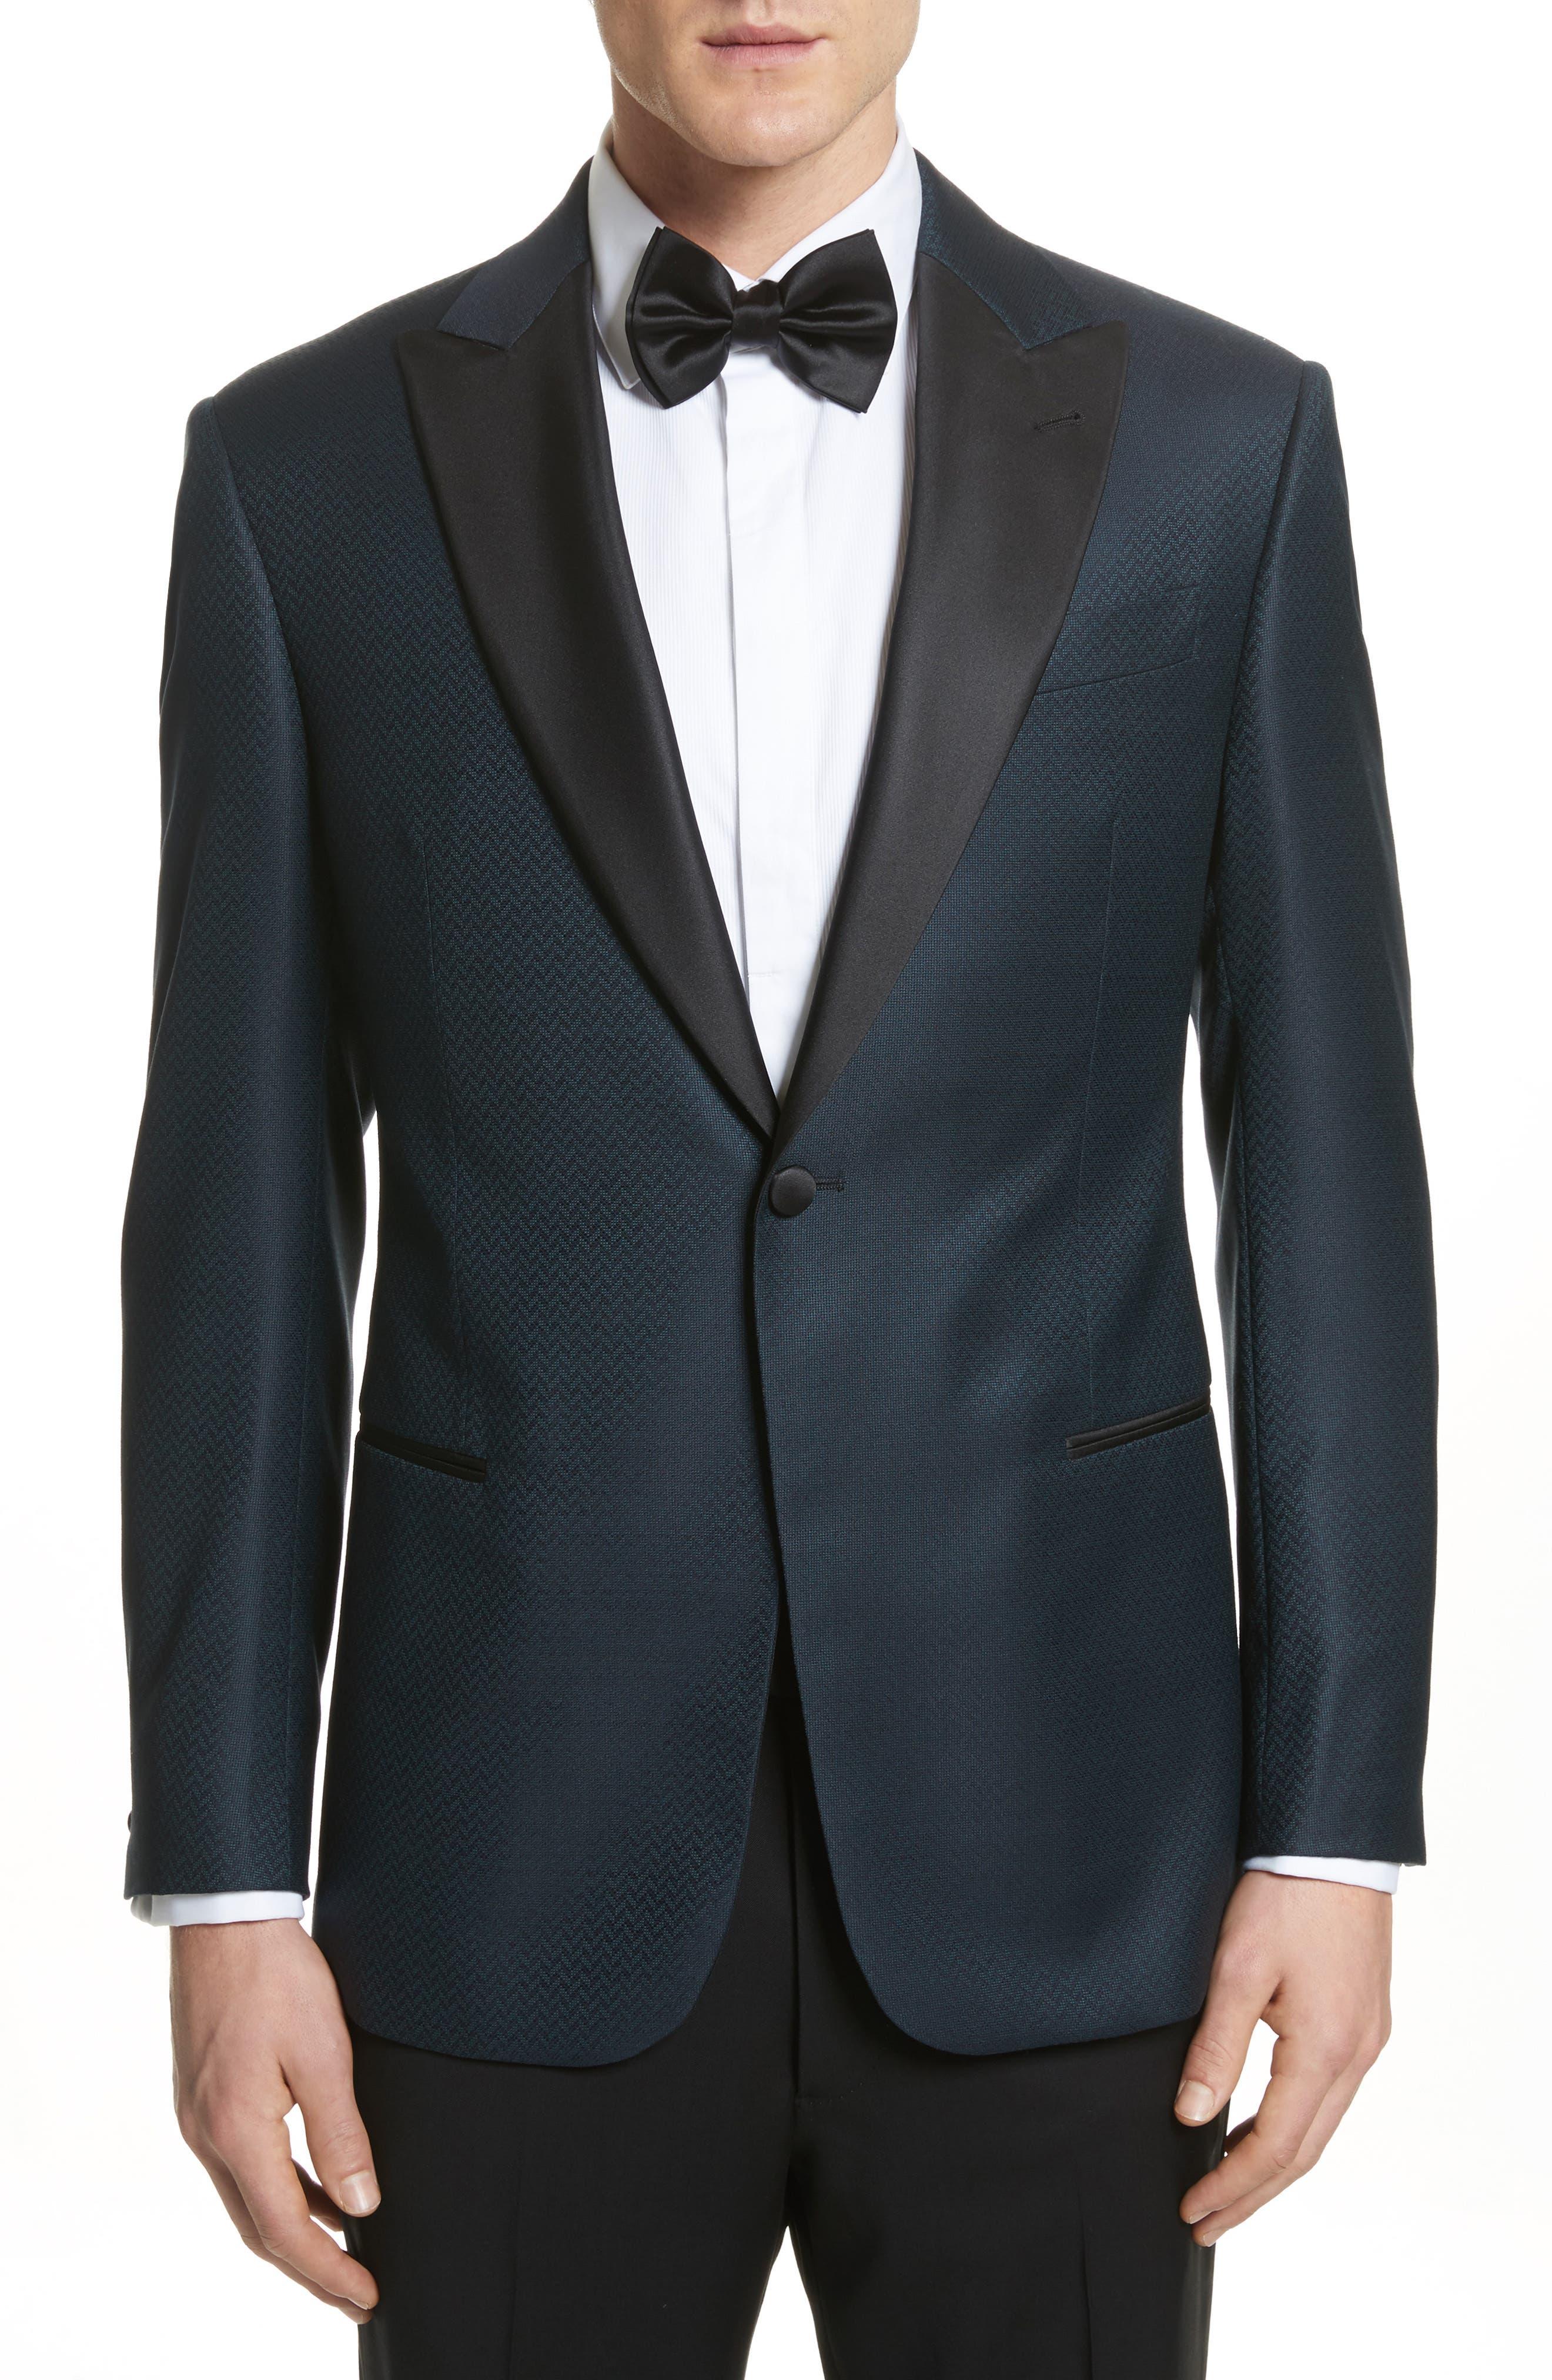 G-Line Trim Fit Wool Dinner Jacket,                         Main,                         color, 459